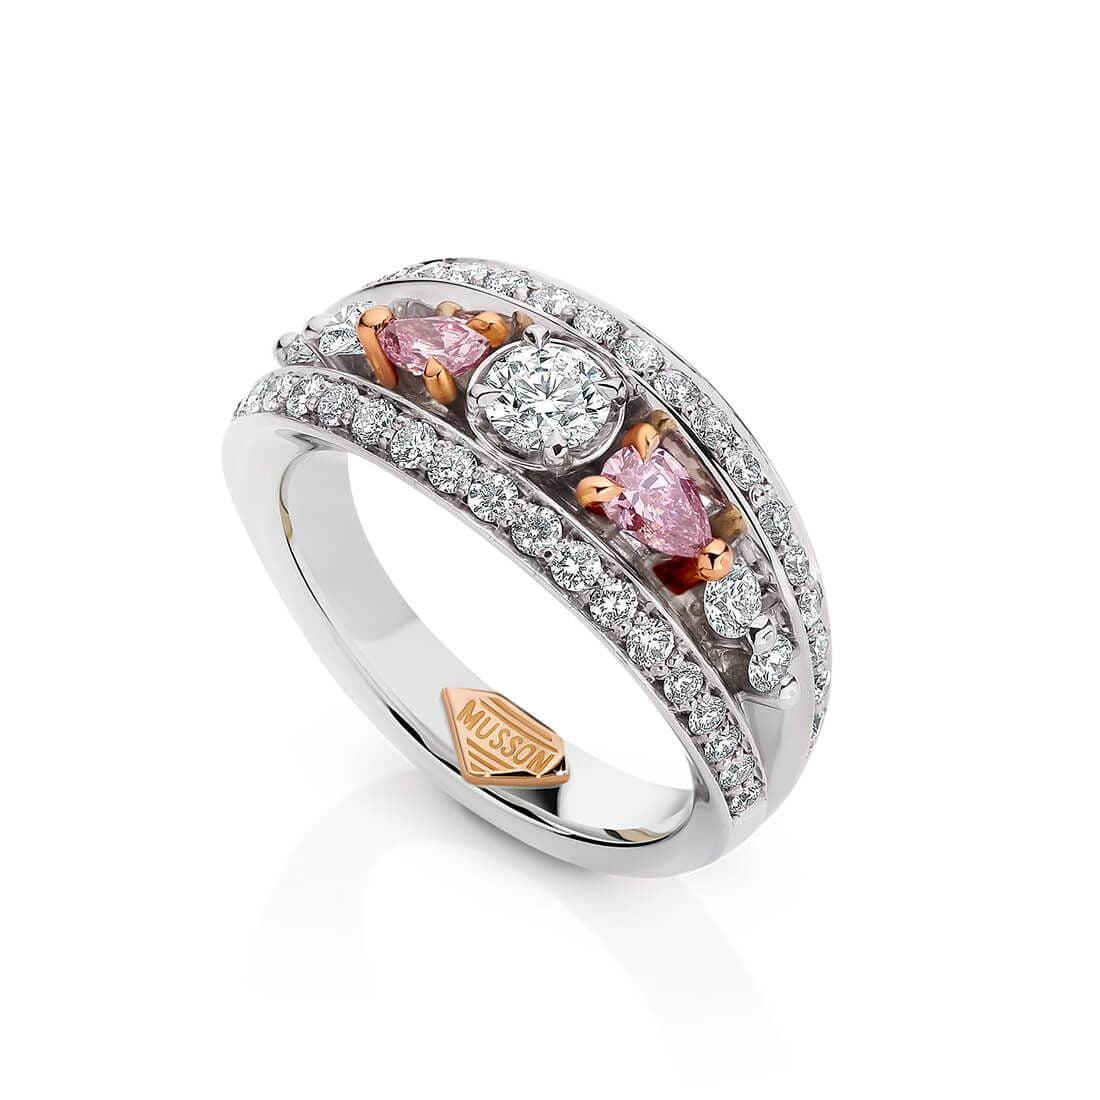 Vivid Bridge Couture Ring, Argyle Pink Diamond